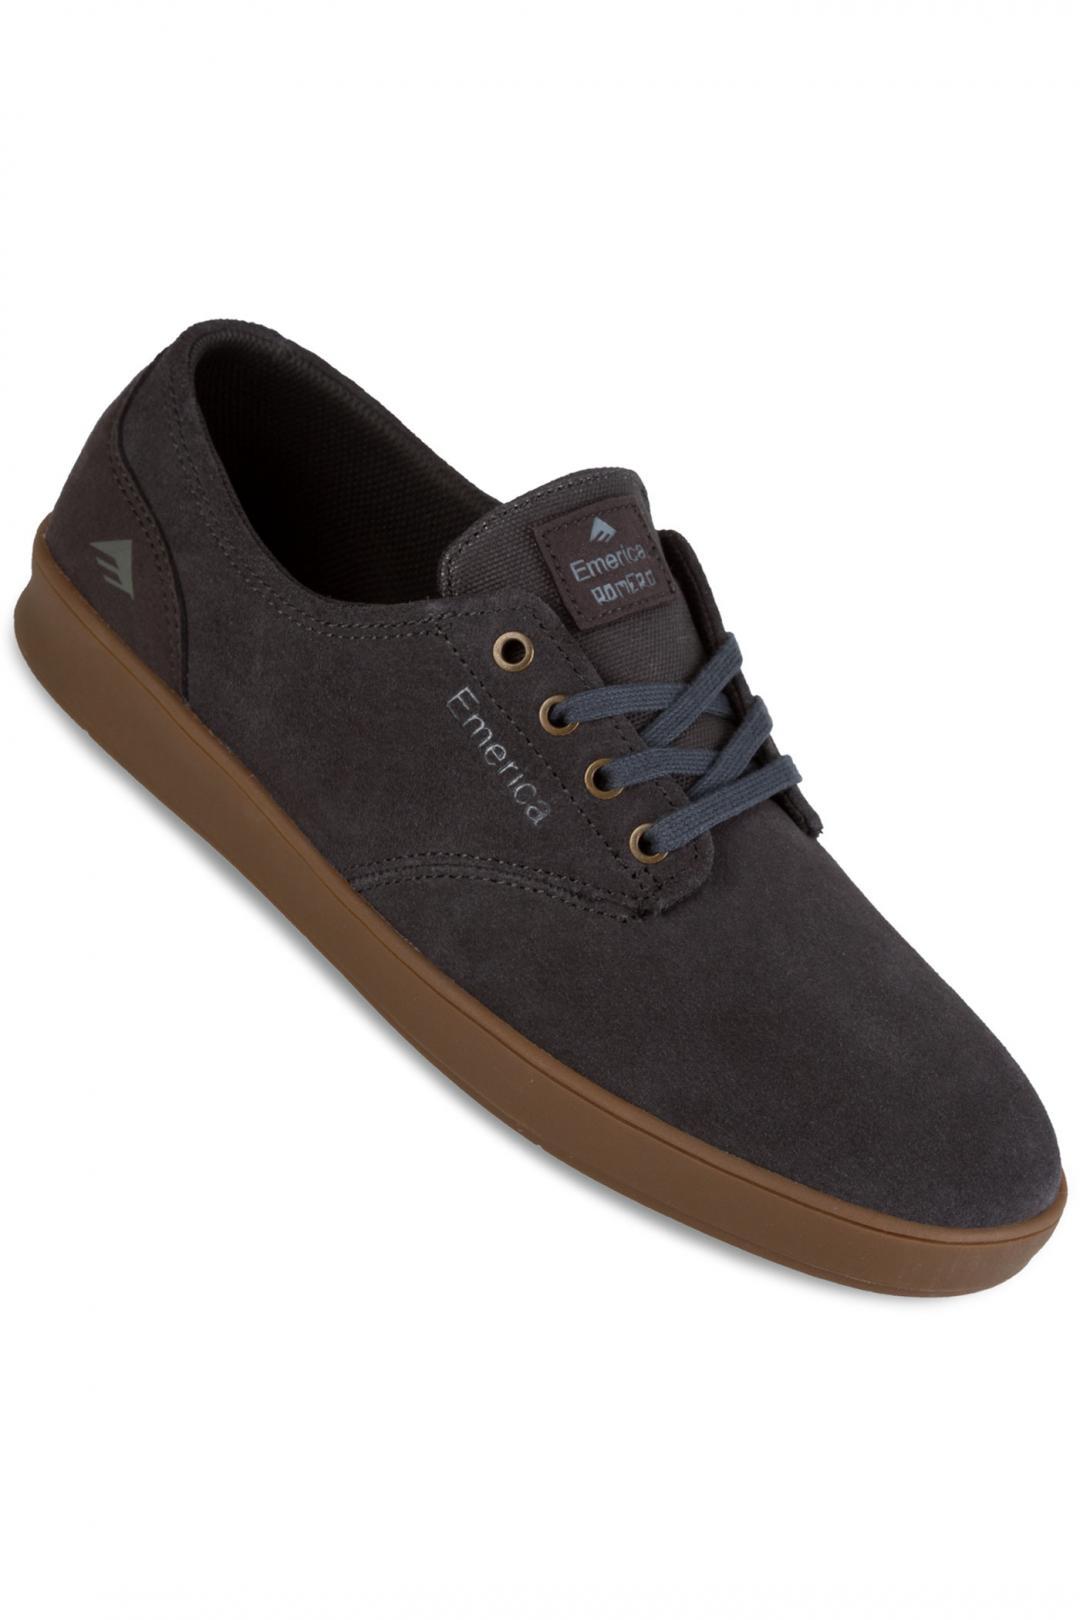 Uomo Emerica The Romero Laced grey gum   Sneakers low top